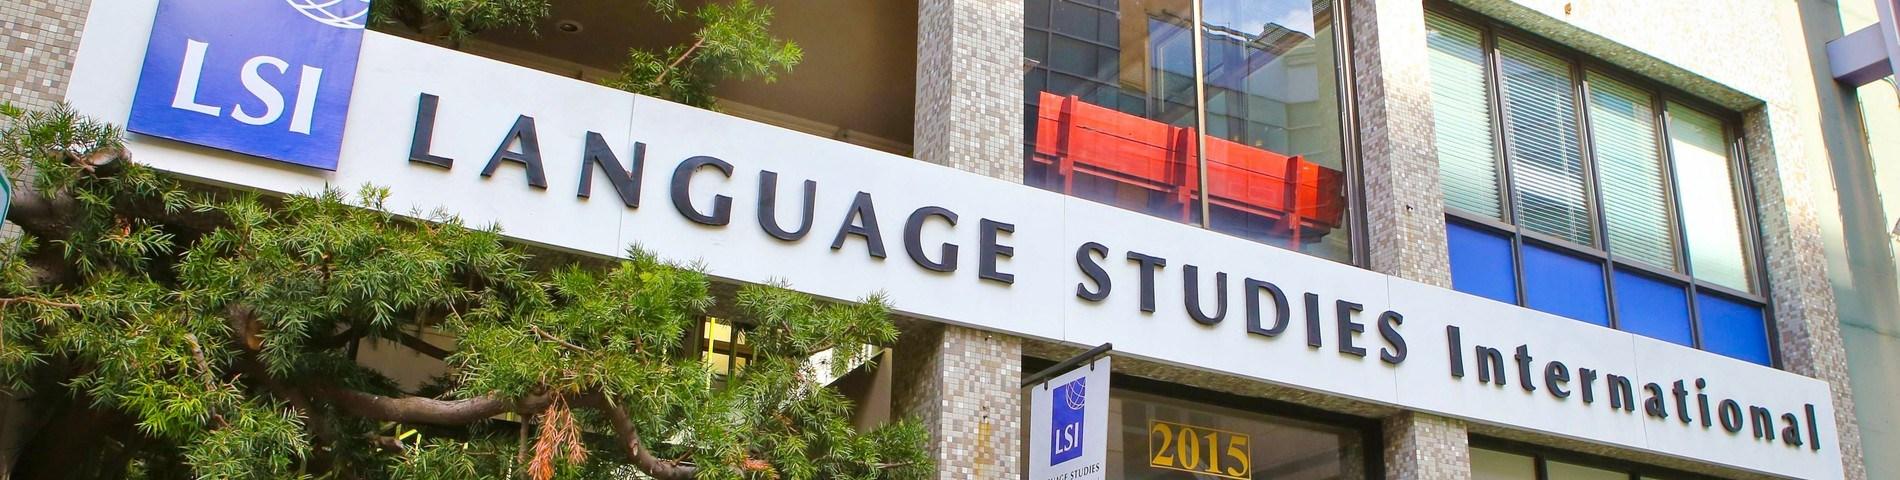 LSI - Language Studies International Bild 1